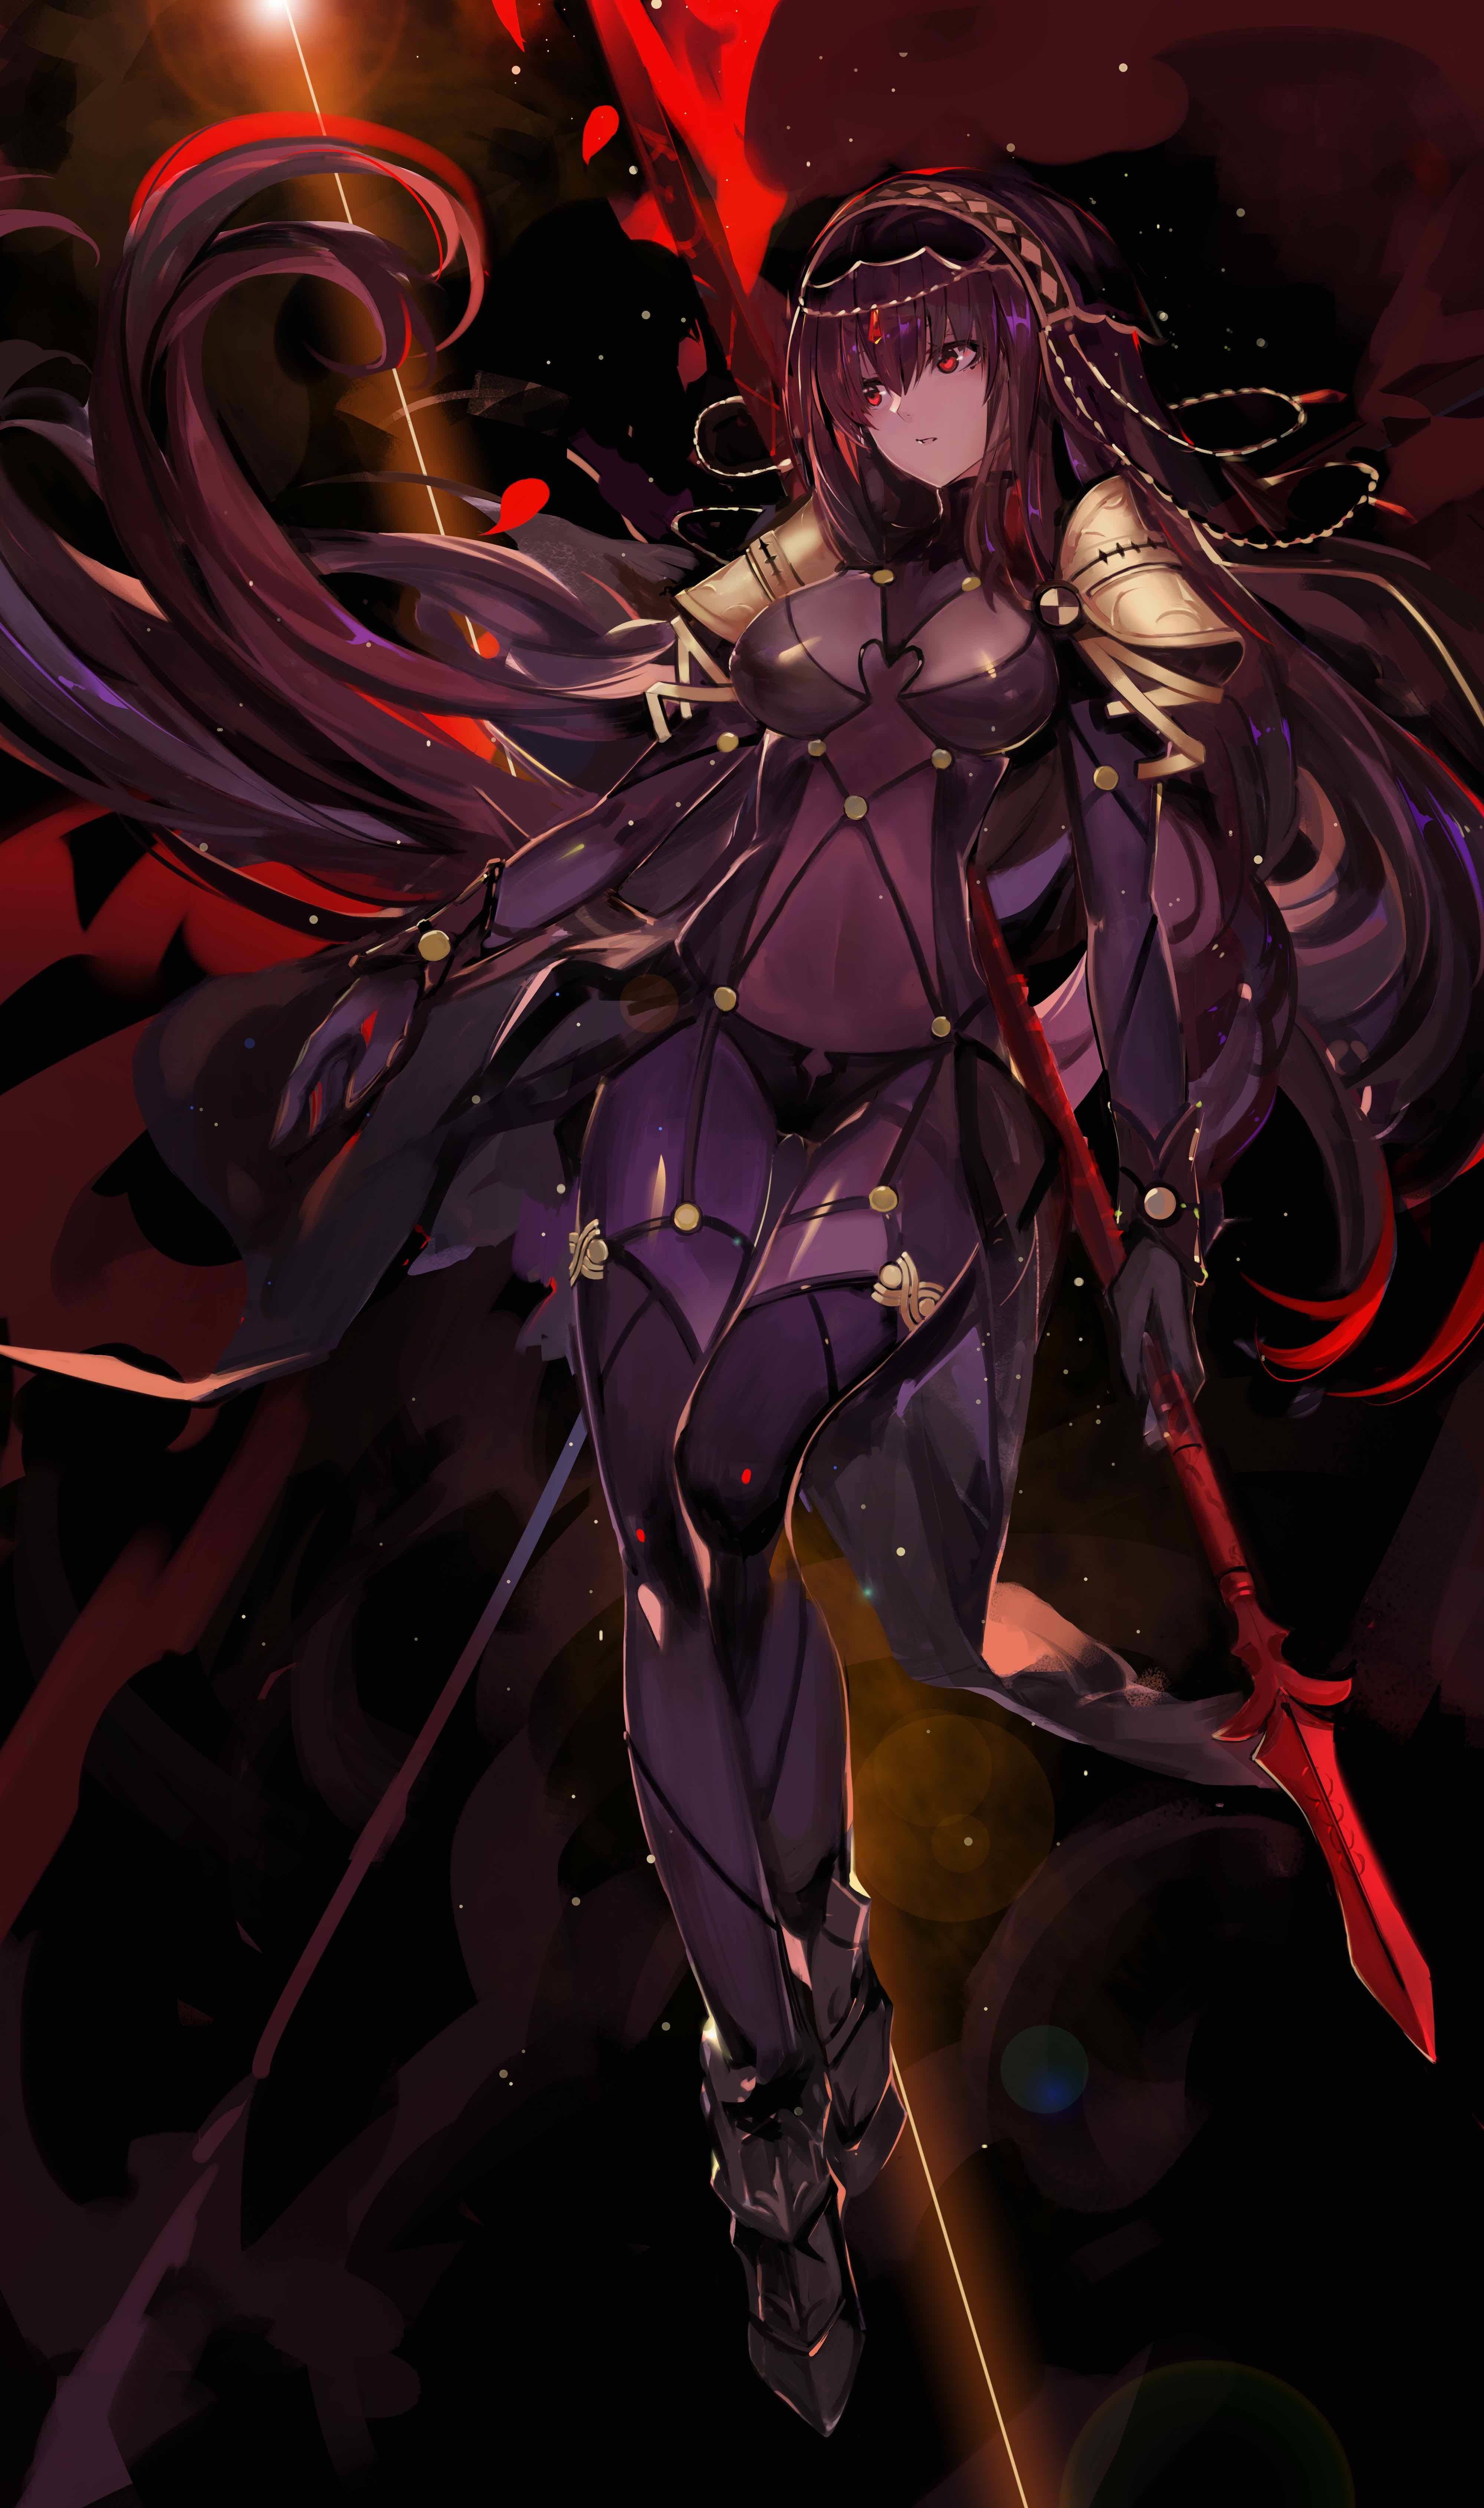 Fate grandorder lancer sc thach - 2017 anime wallpaper ...